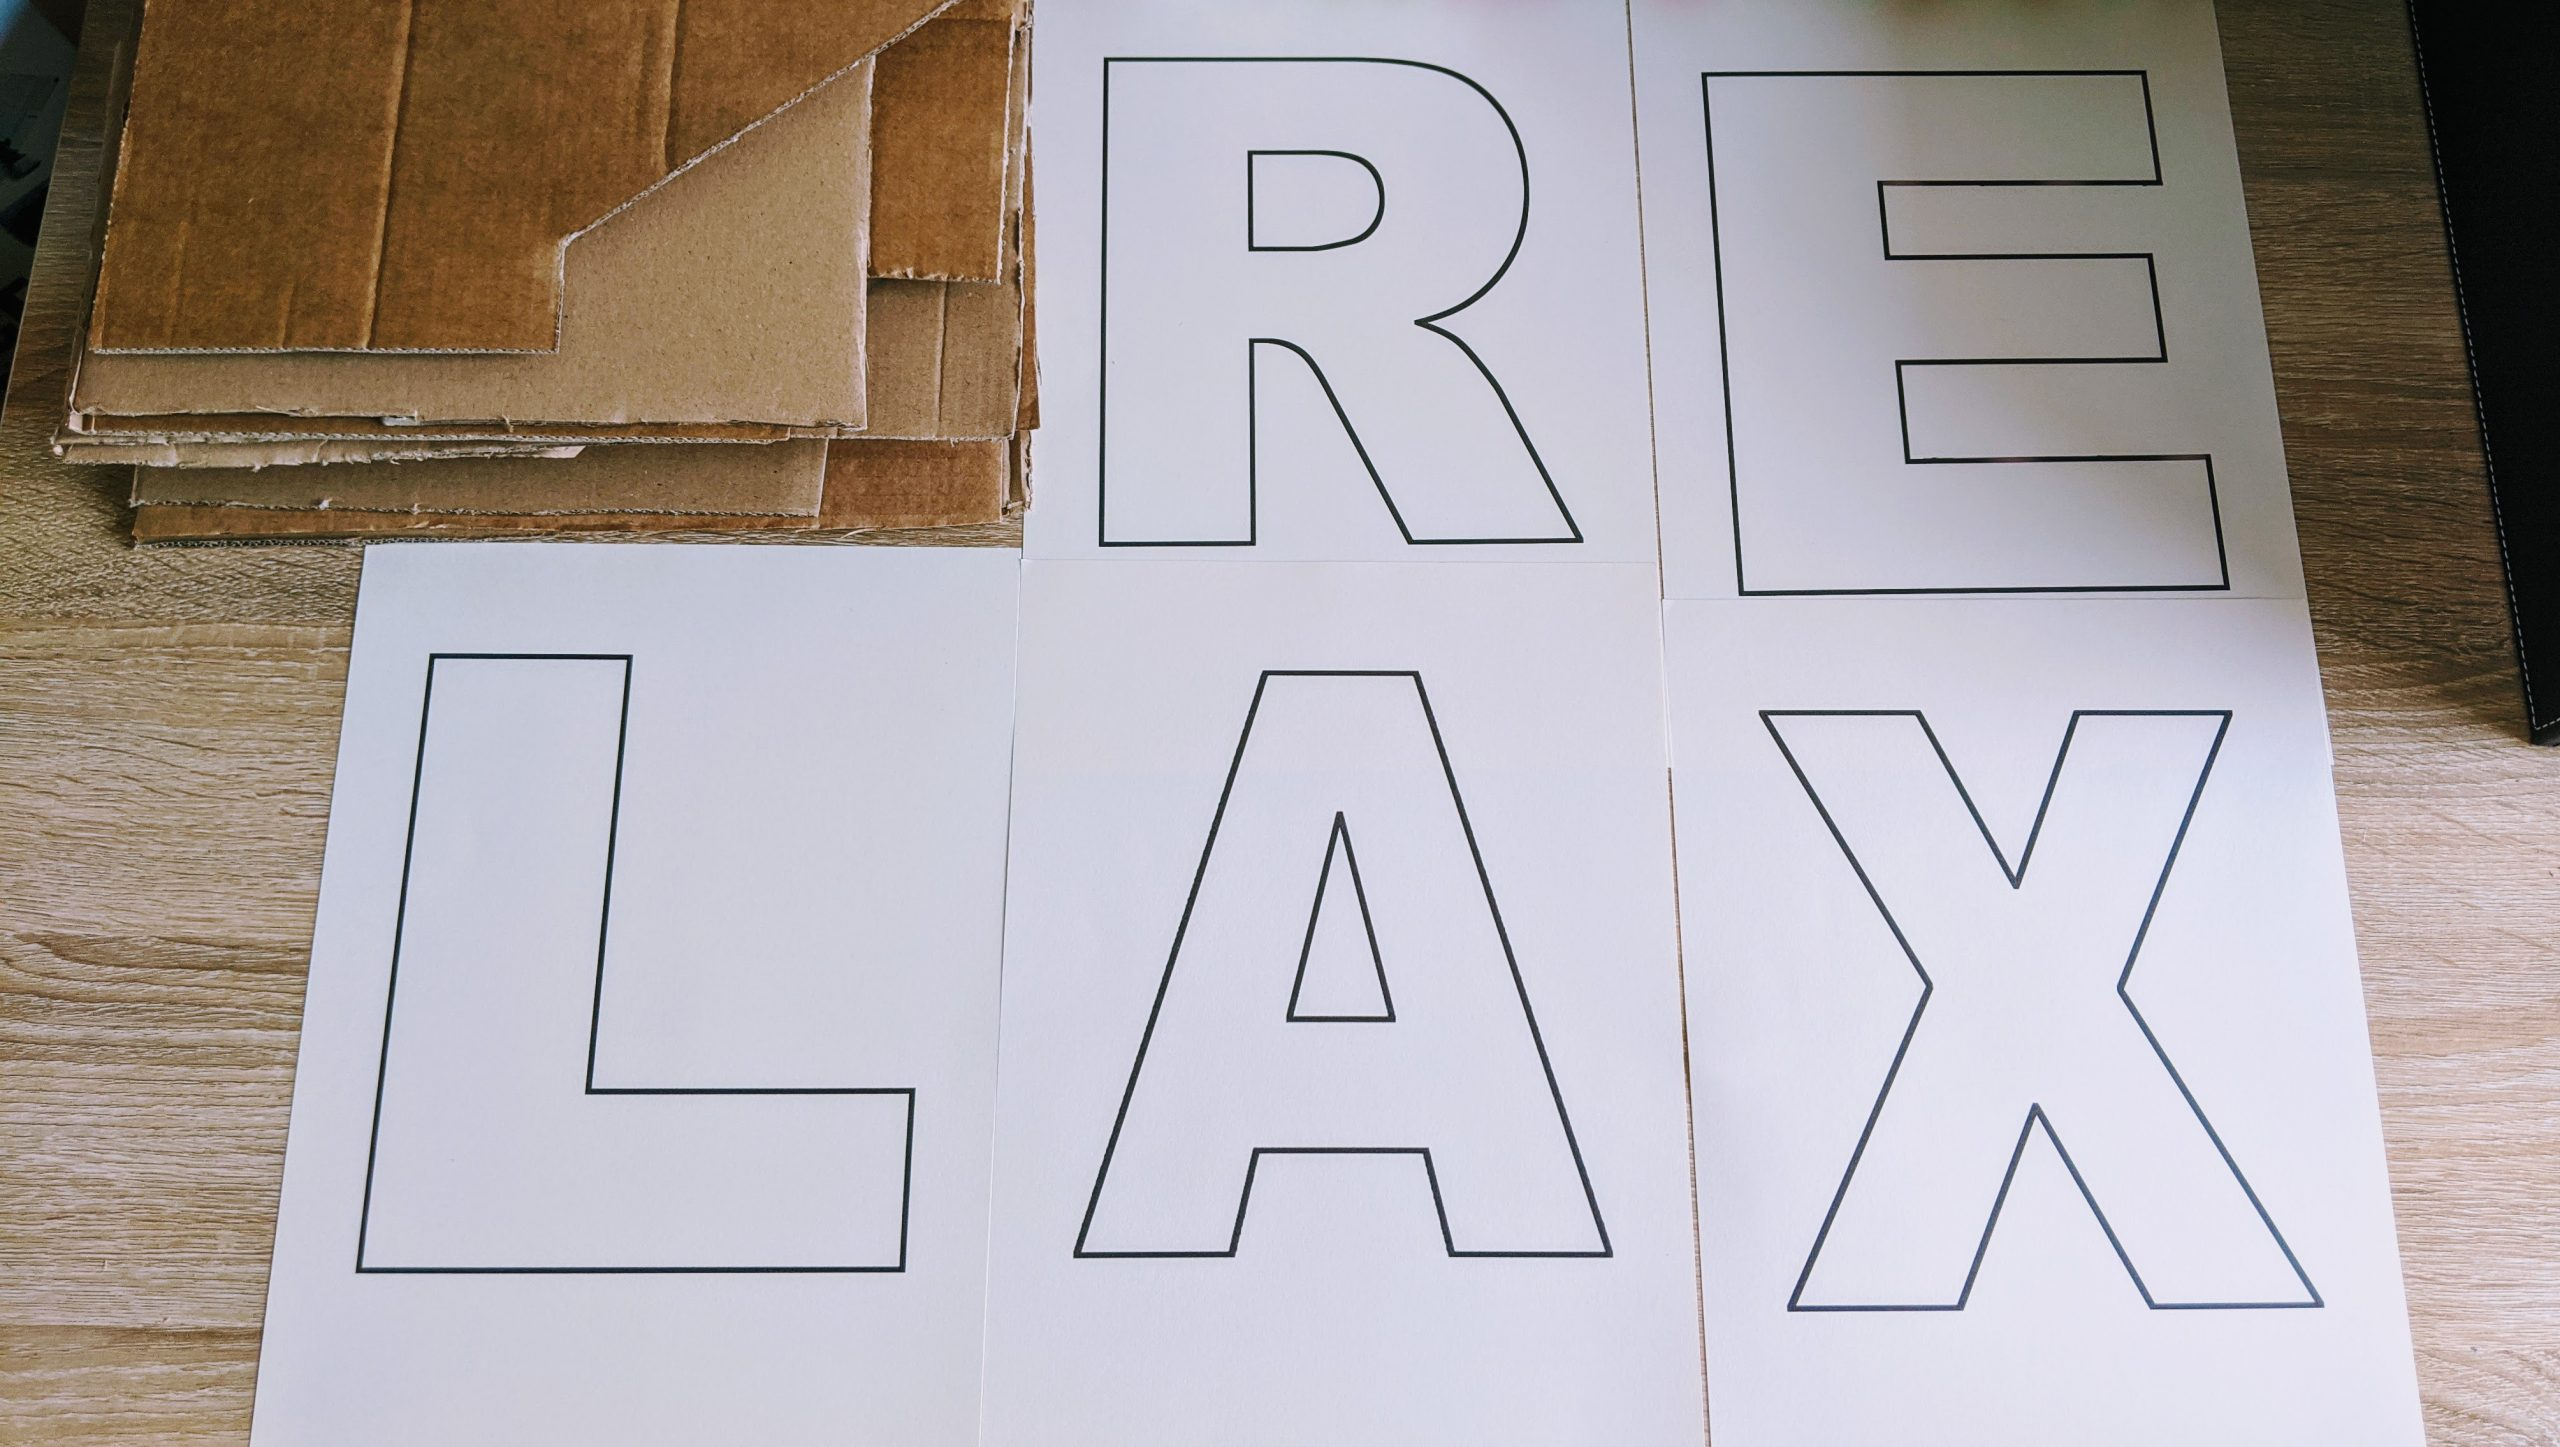 Making cardboard letters